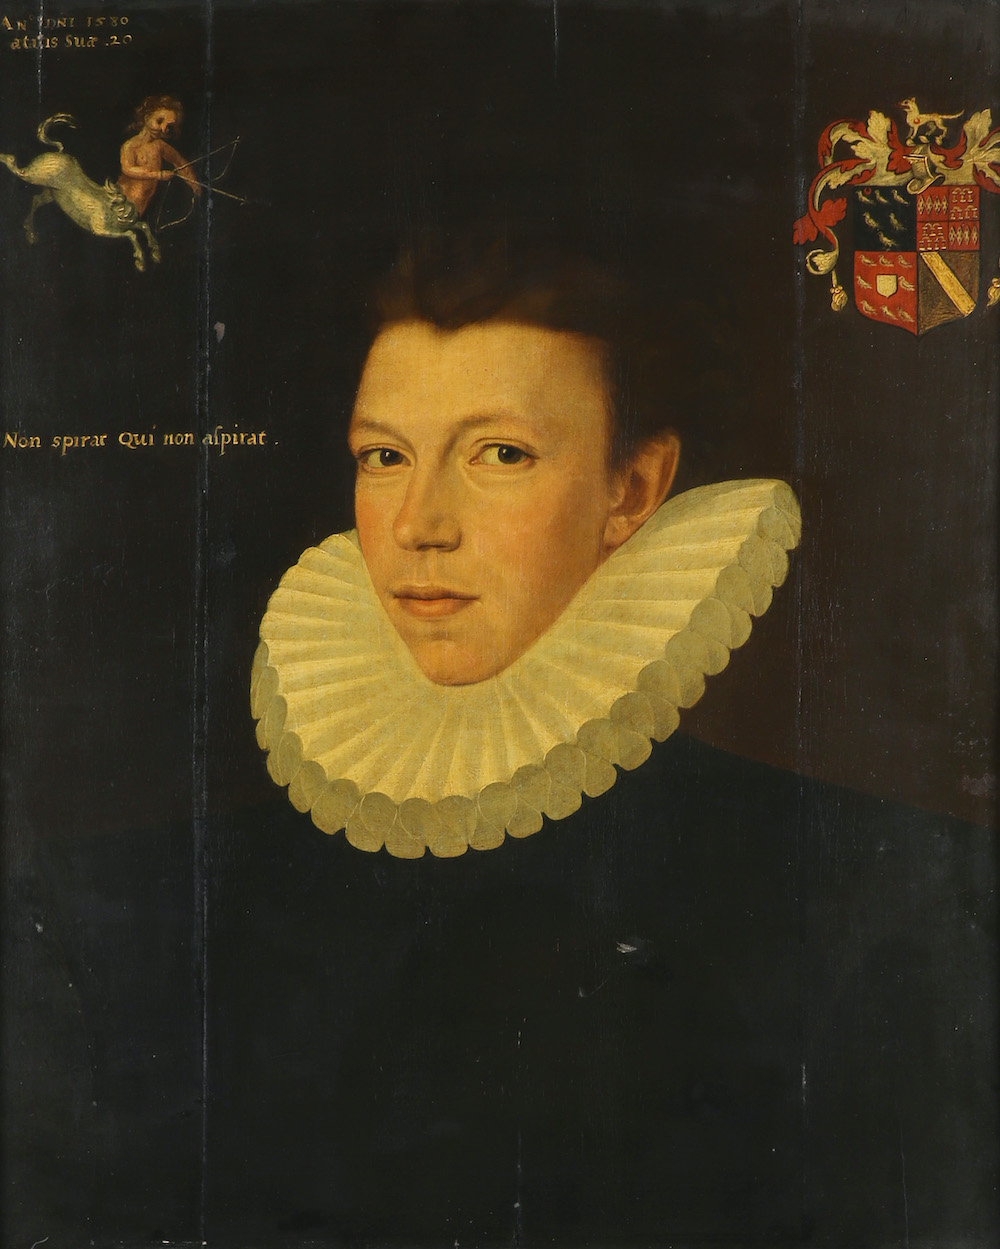 Portrait of Thomas Arundell, 1st Baron Arundell of Wardour (1560-1639)